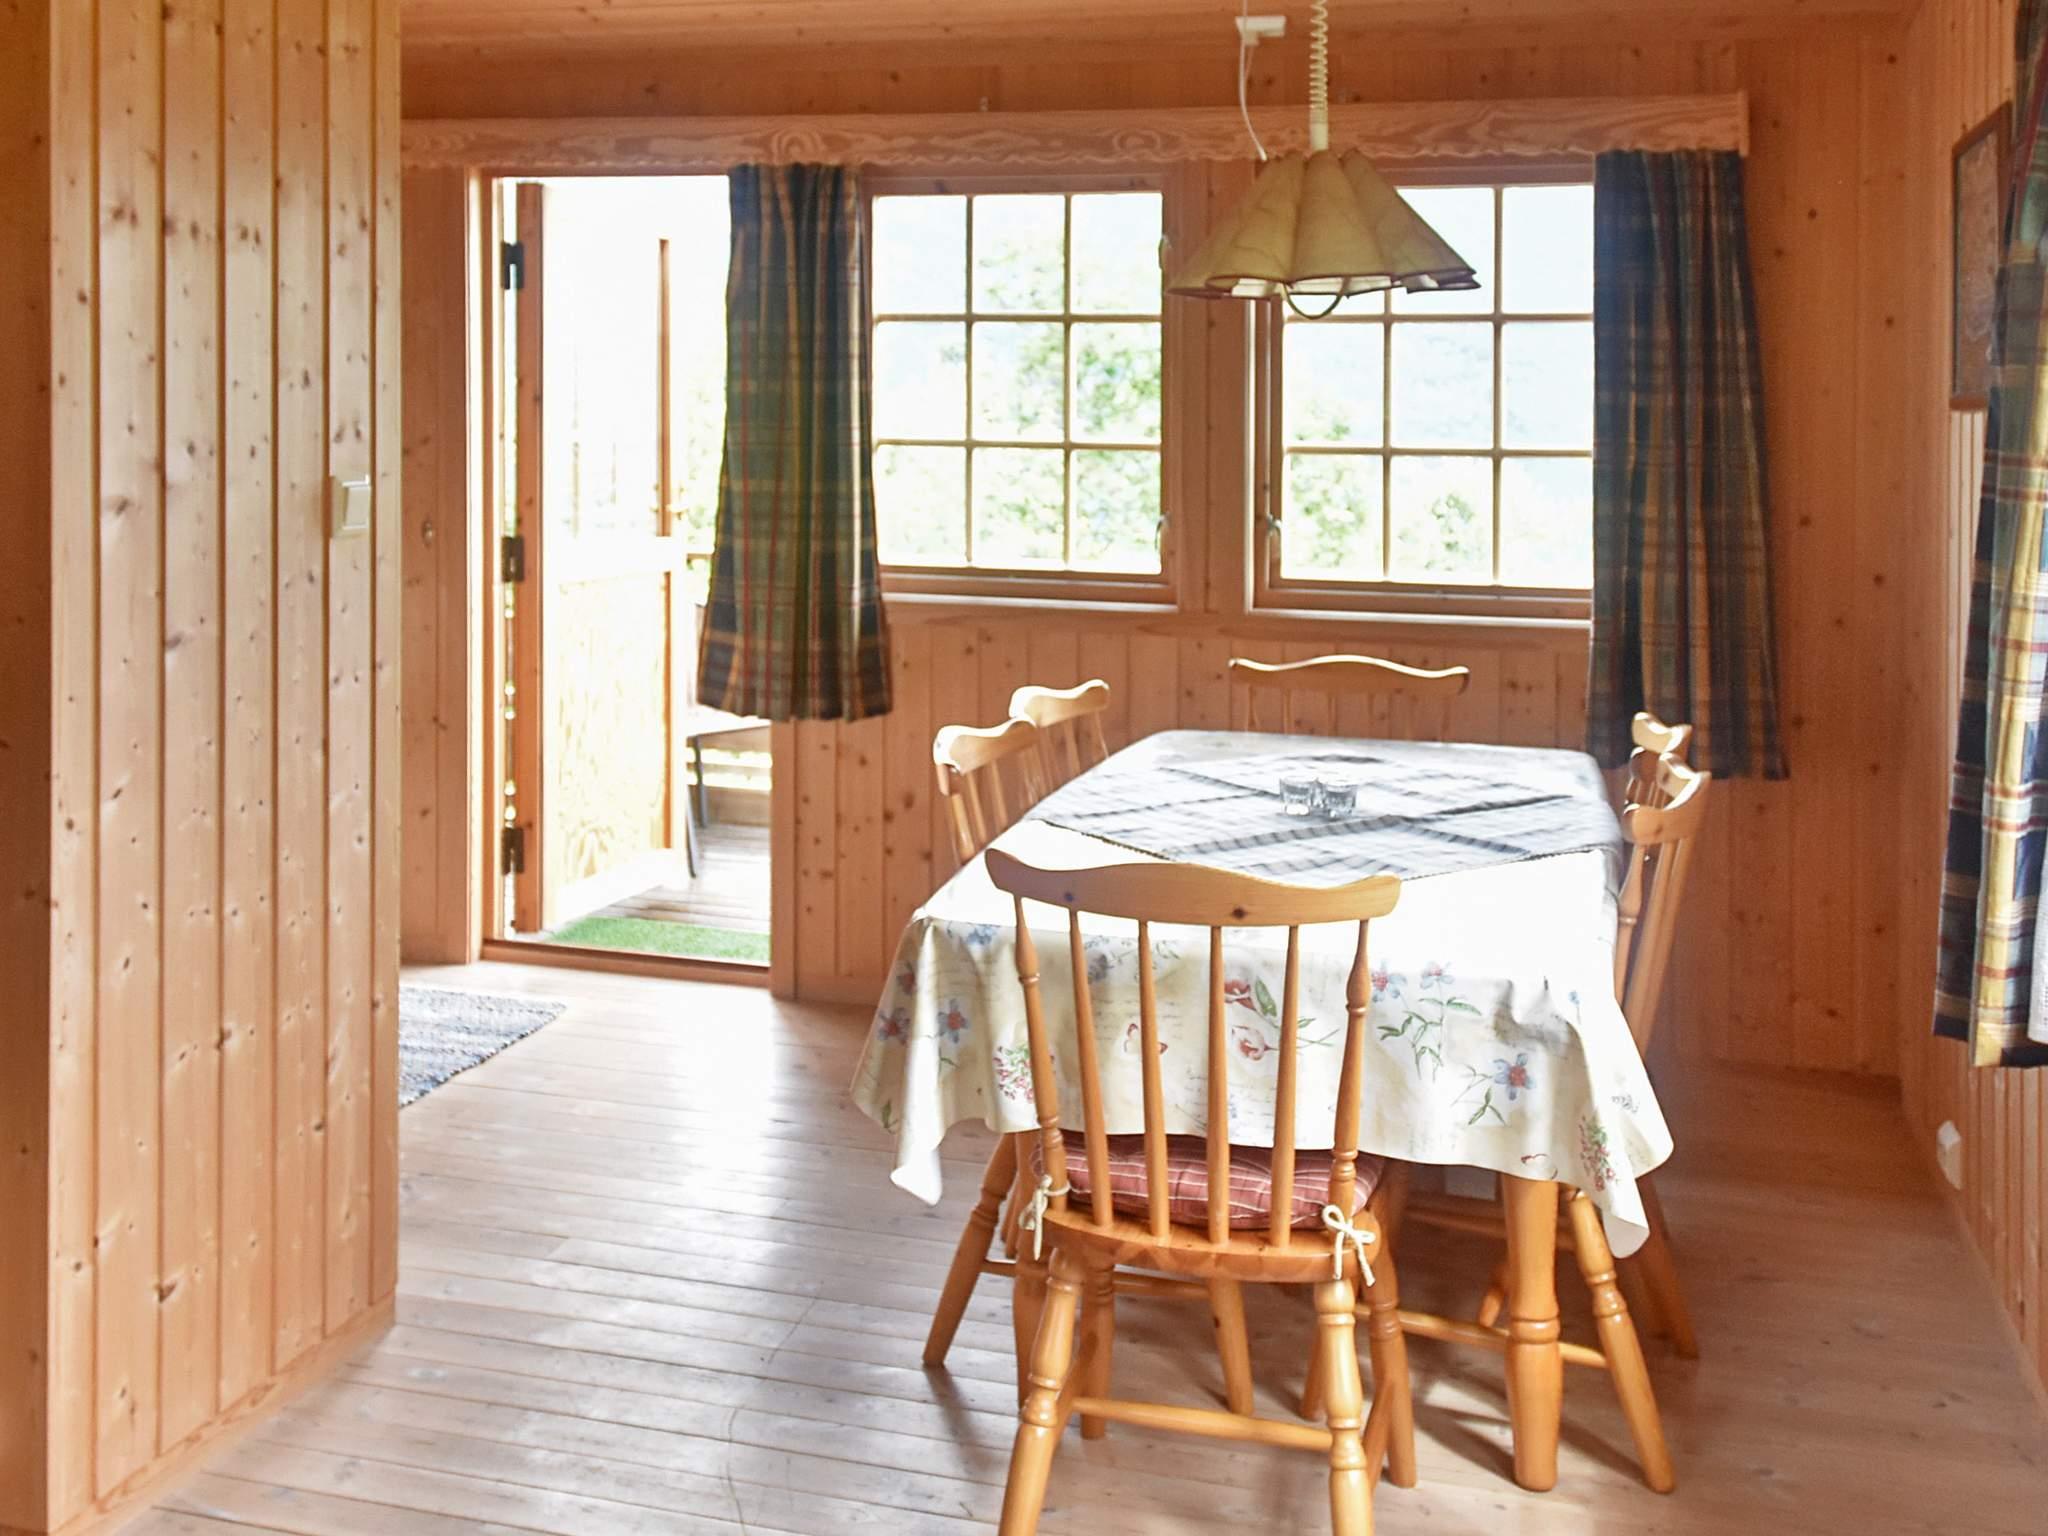 Ferienhaus Tistam (84697), Utvik, Sognefjord - Nordfjord, Westnorwegen, Norwegen, Bild 5